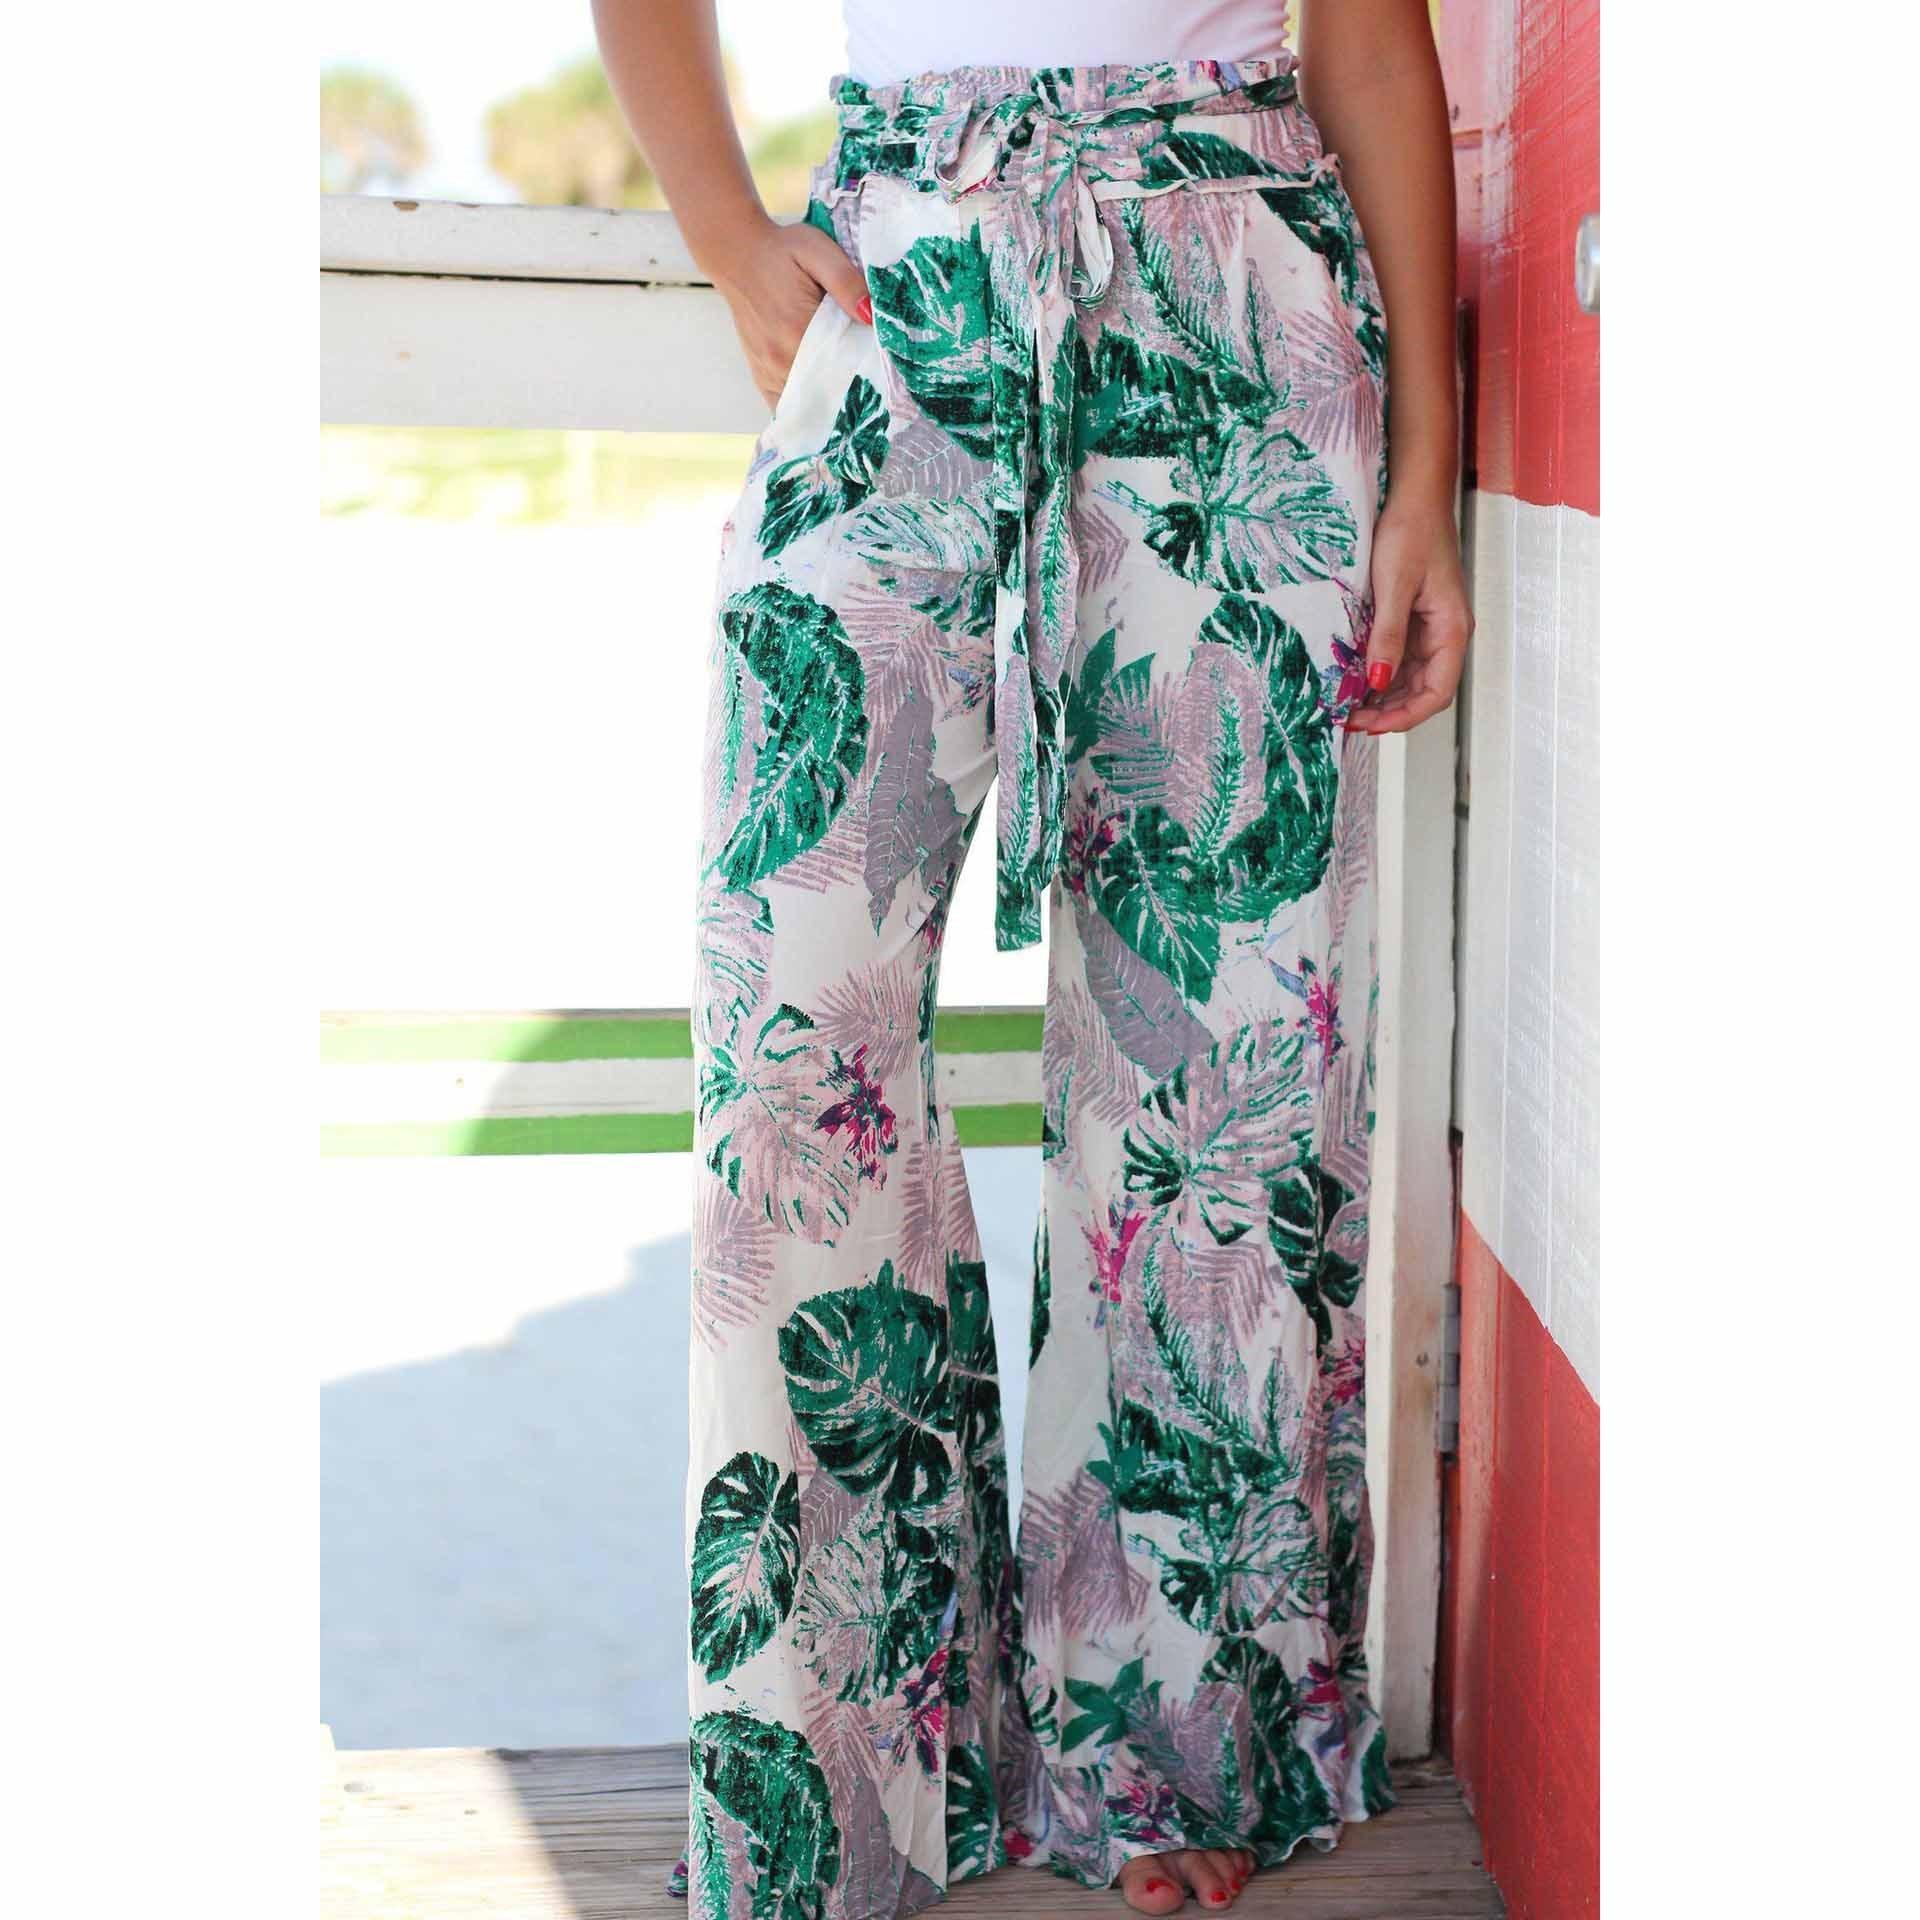 UPONACT 2019 Boho Women Wide Leg Pocket Summer Casual Loose Elastic High Waist